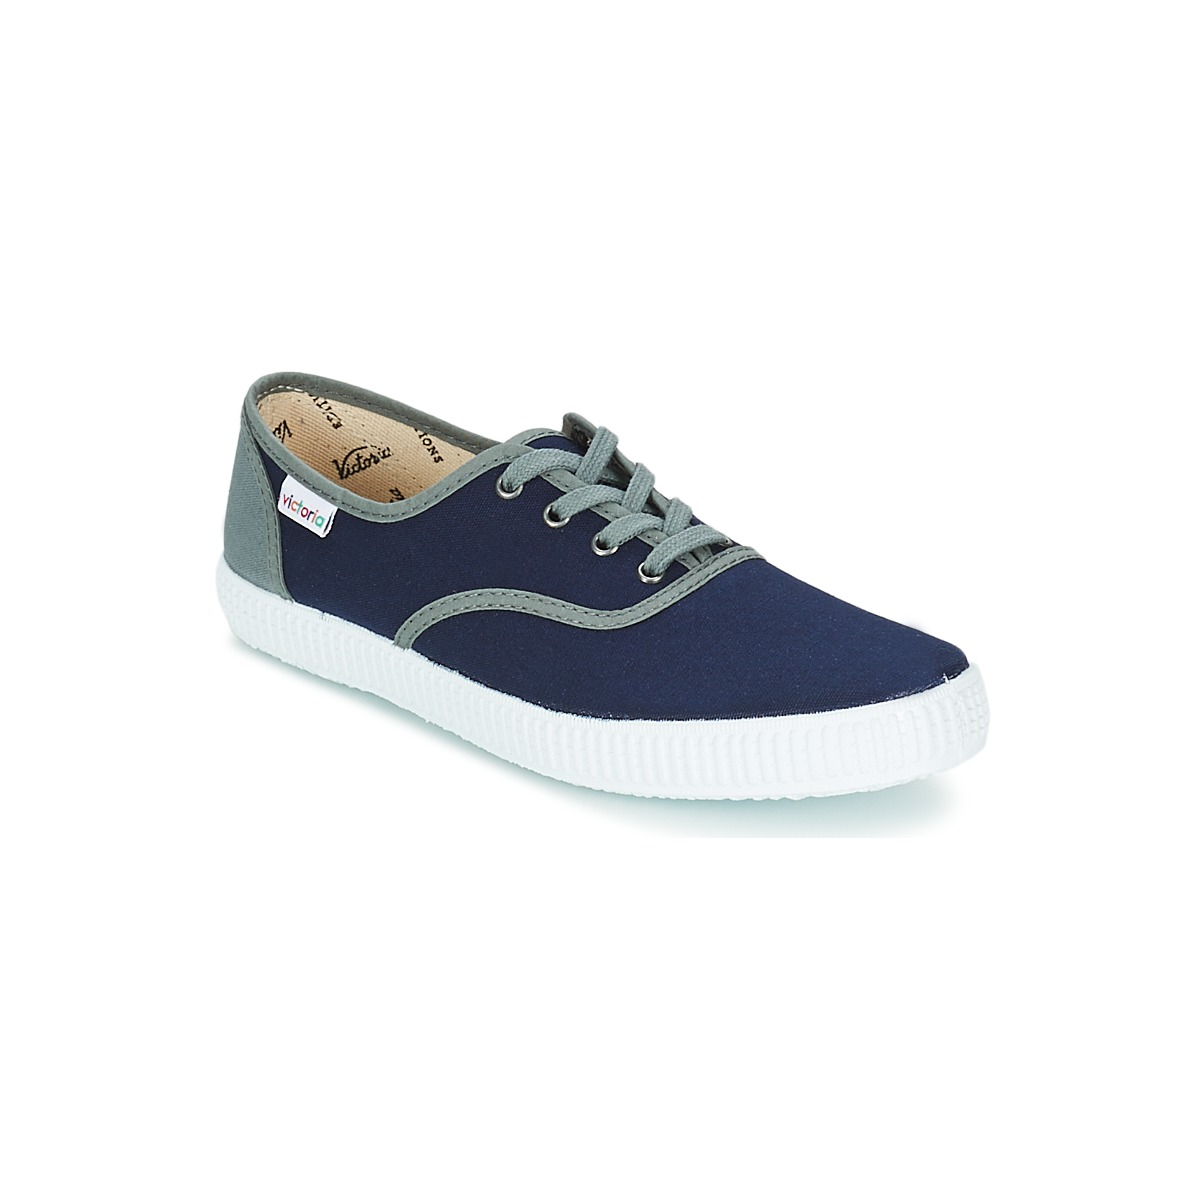 Victoria INGLESA LONA DETALL CONTRAS Marine - Kostenloser Versand bei Spartoode ! - Schuhe Sneaker Low  18,00 €